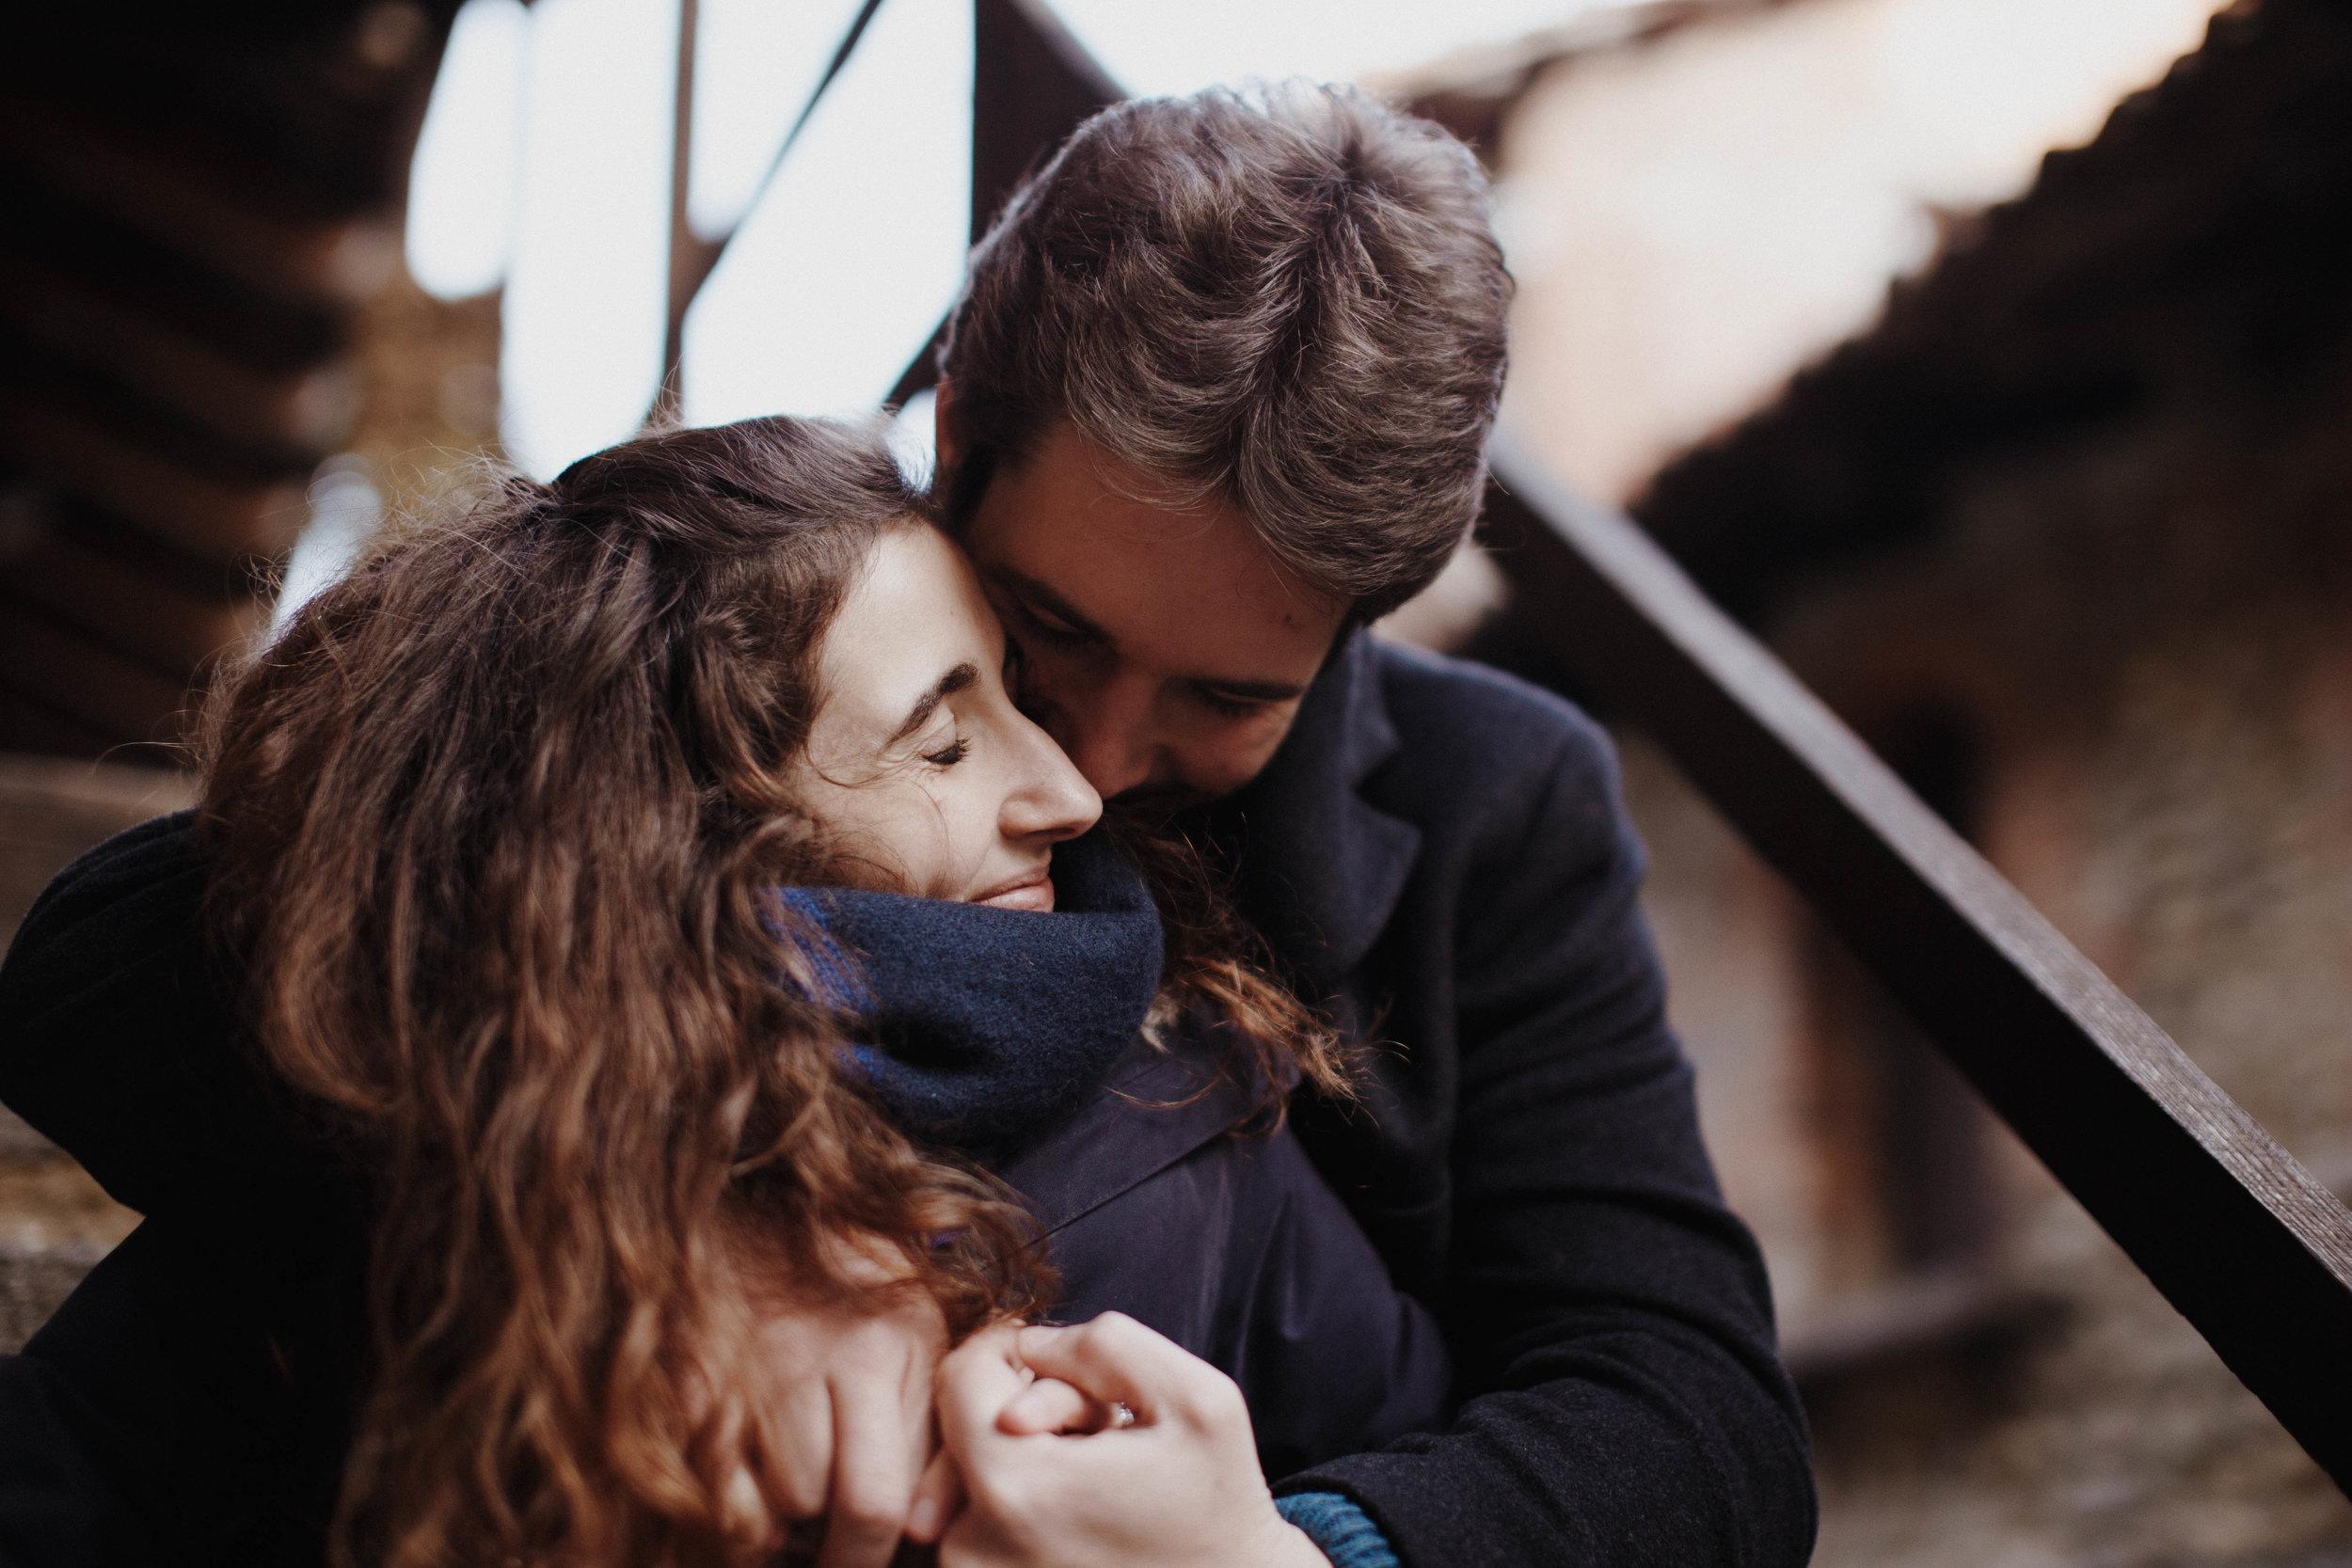 061 - Elisa + Riccardo - engagement.JPG